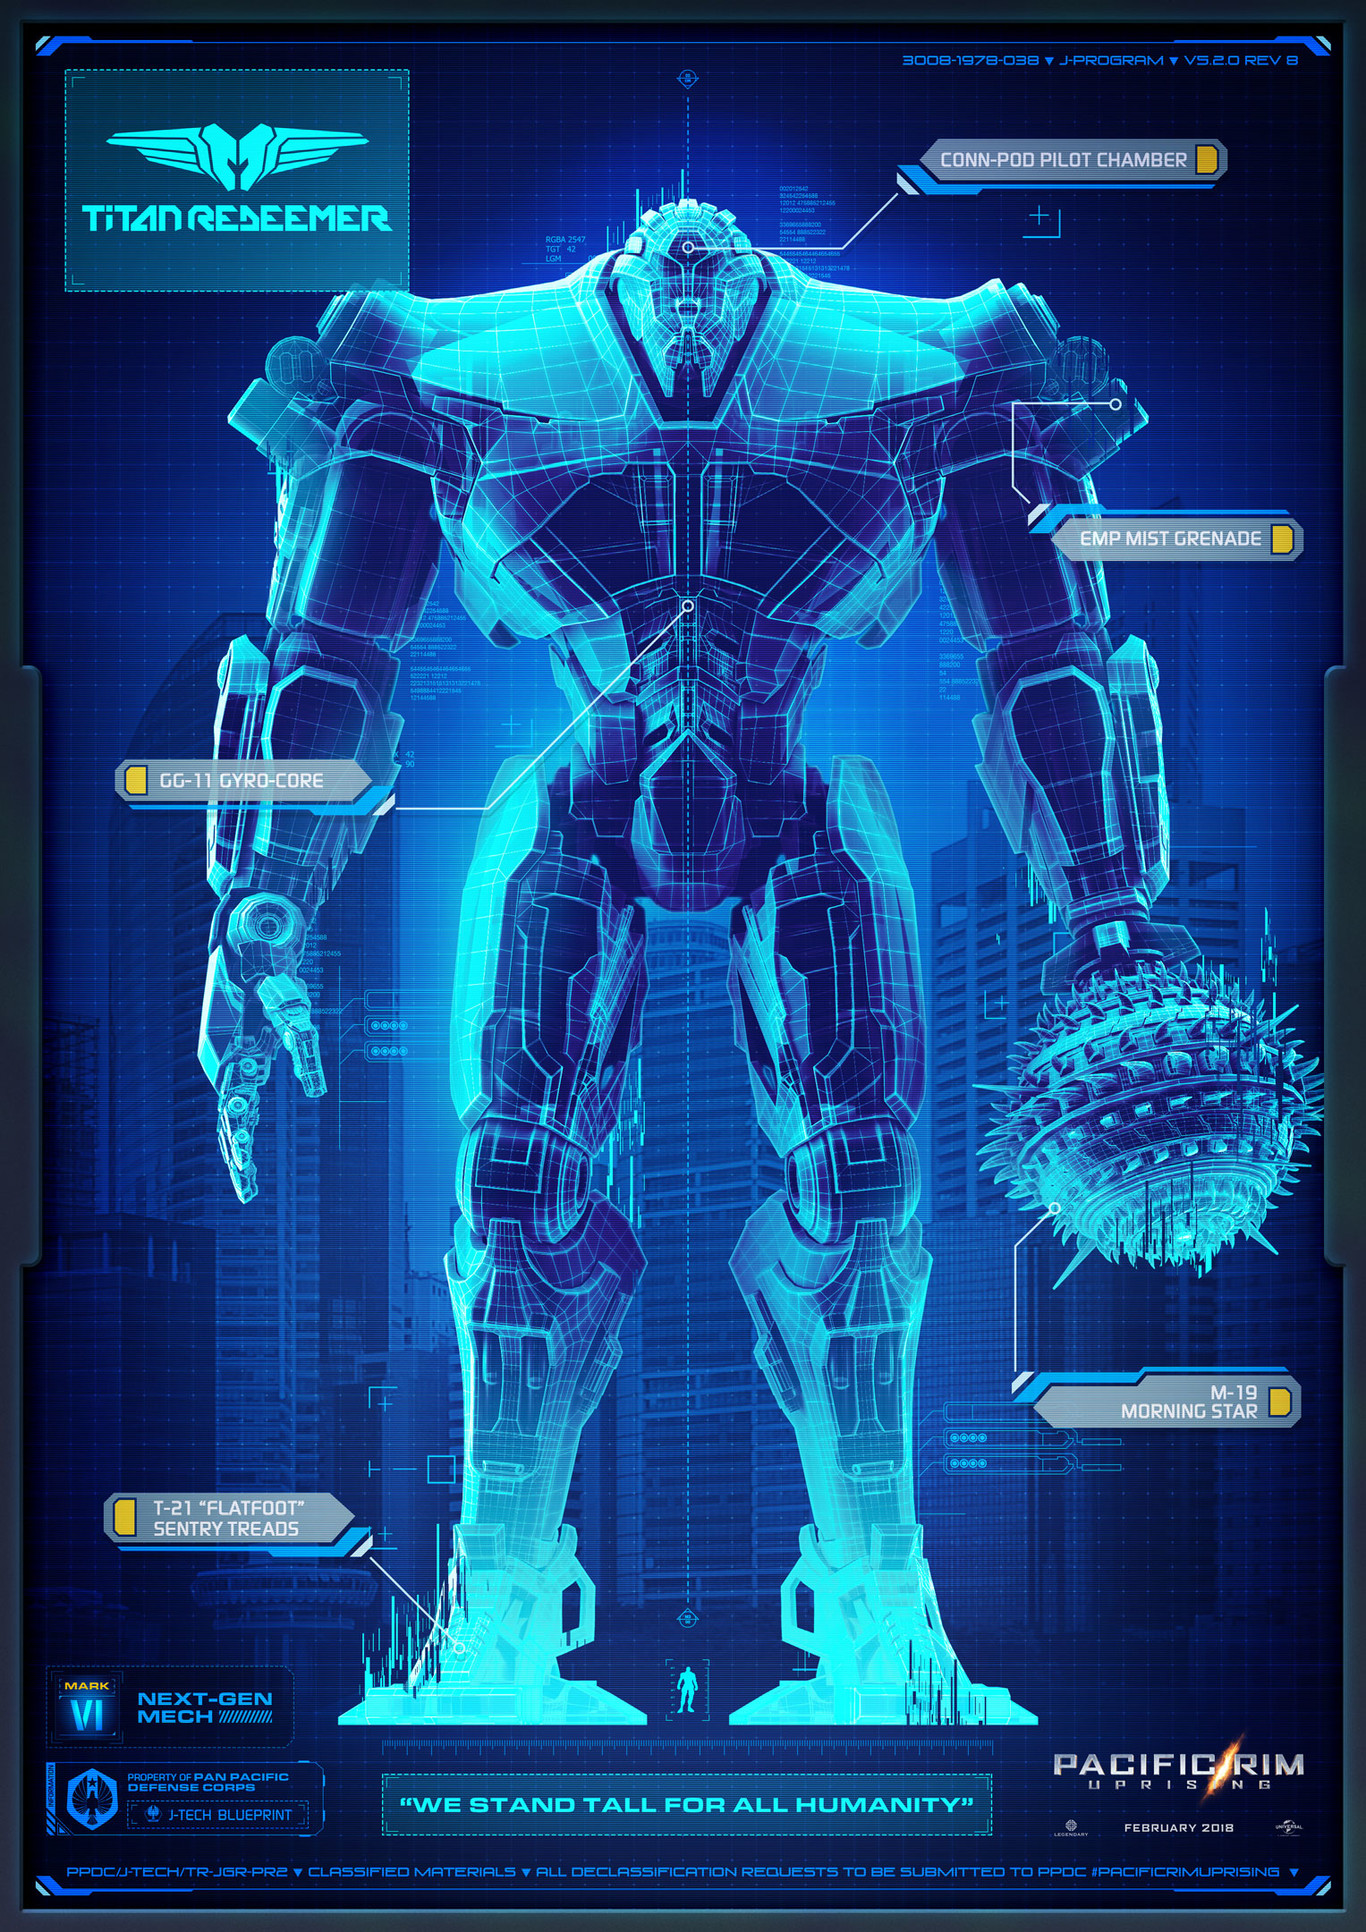 Pr2 01 1 81 Blueprint 2160px